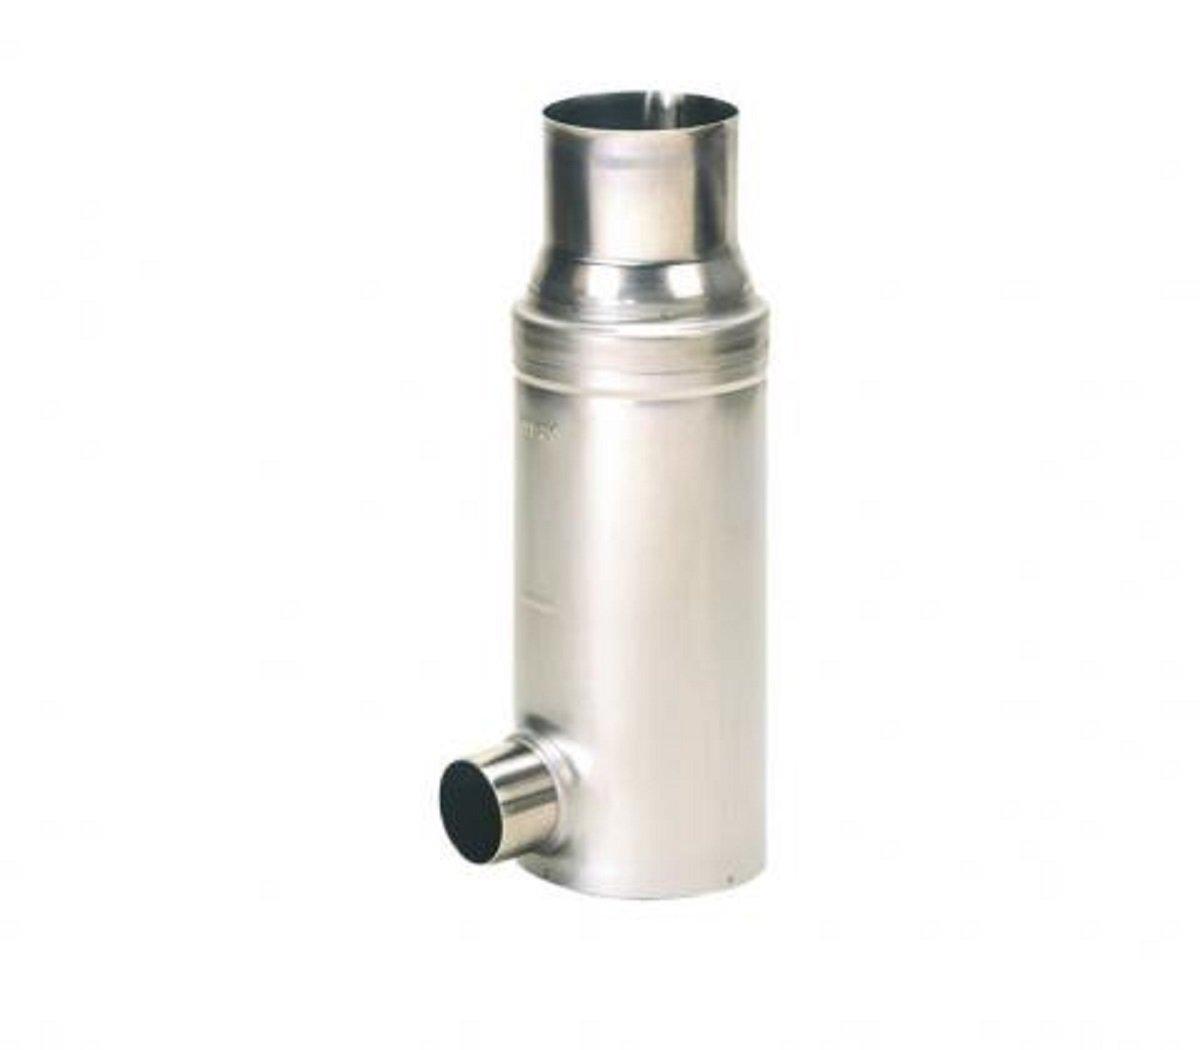 WISY Regenwasserfallrohrfilter für Metall-Fallrohre DN 80,